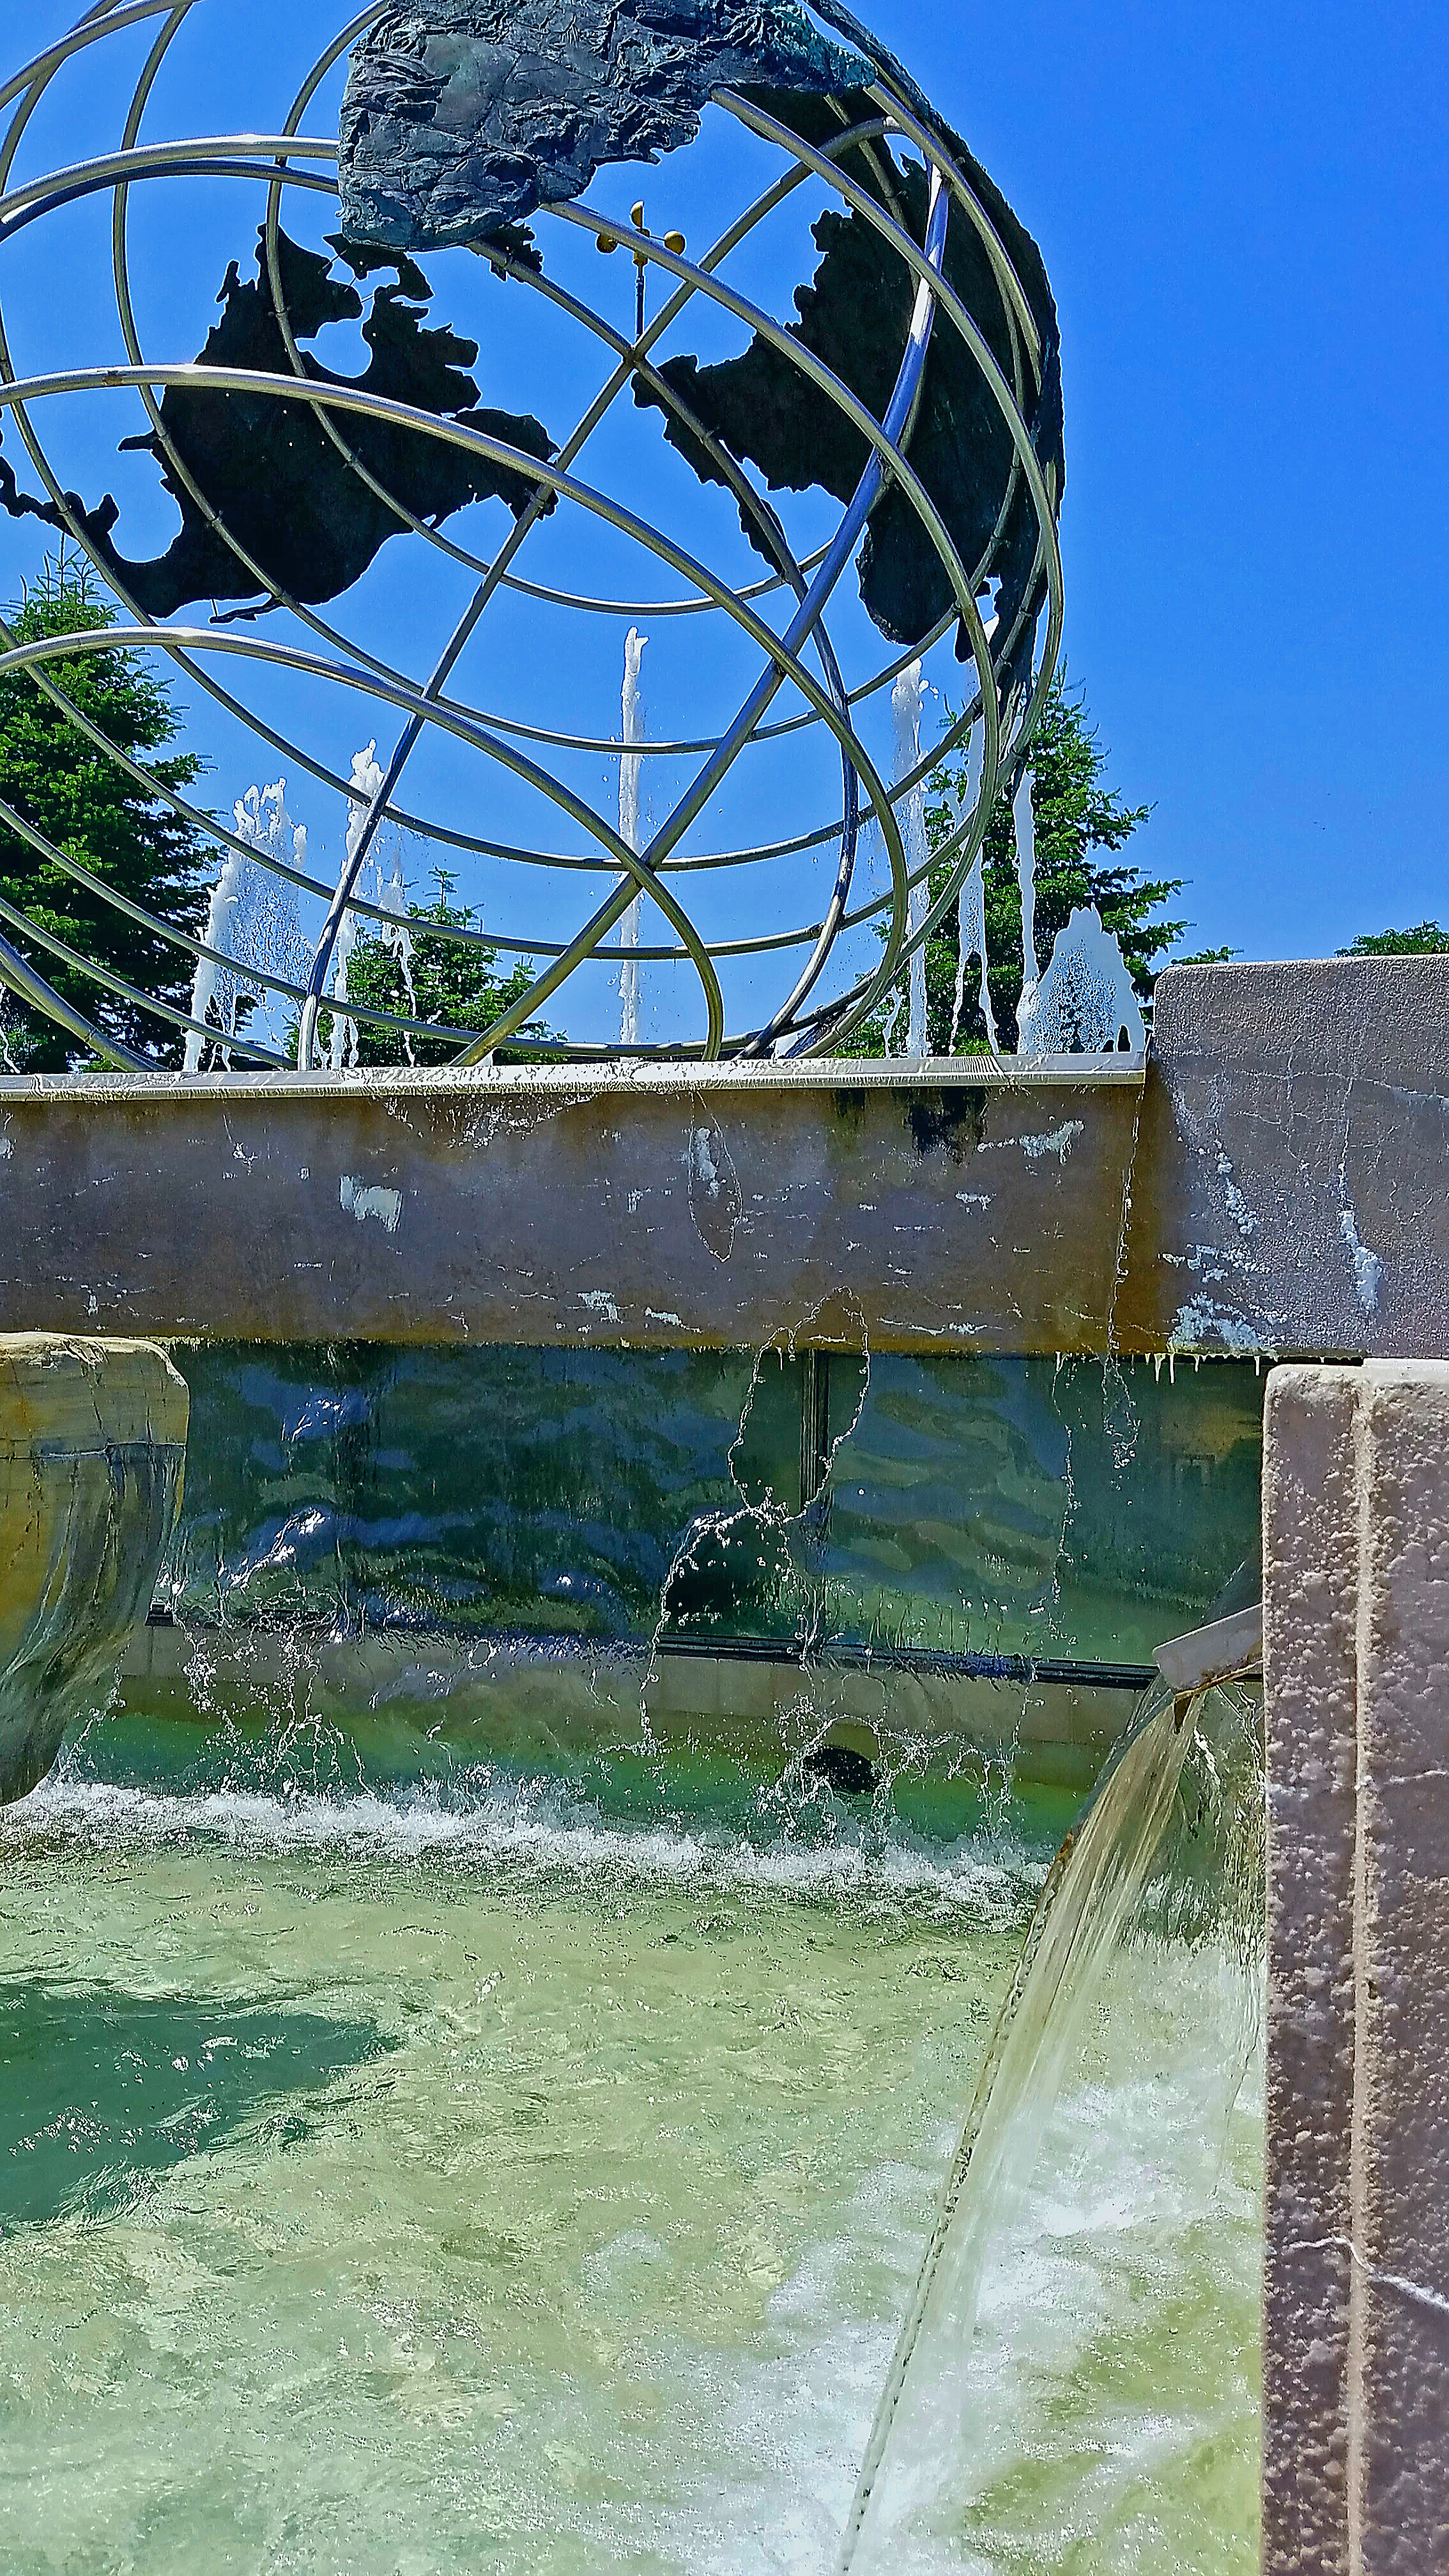 Veterans Memorial Fountain  in Kenosha WI - Carole Kincaid.jpg